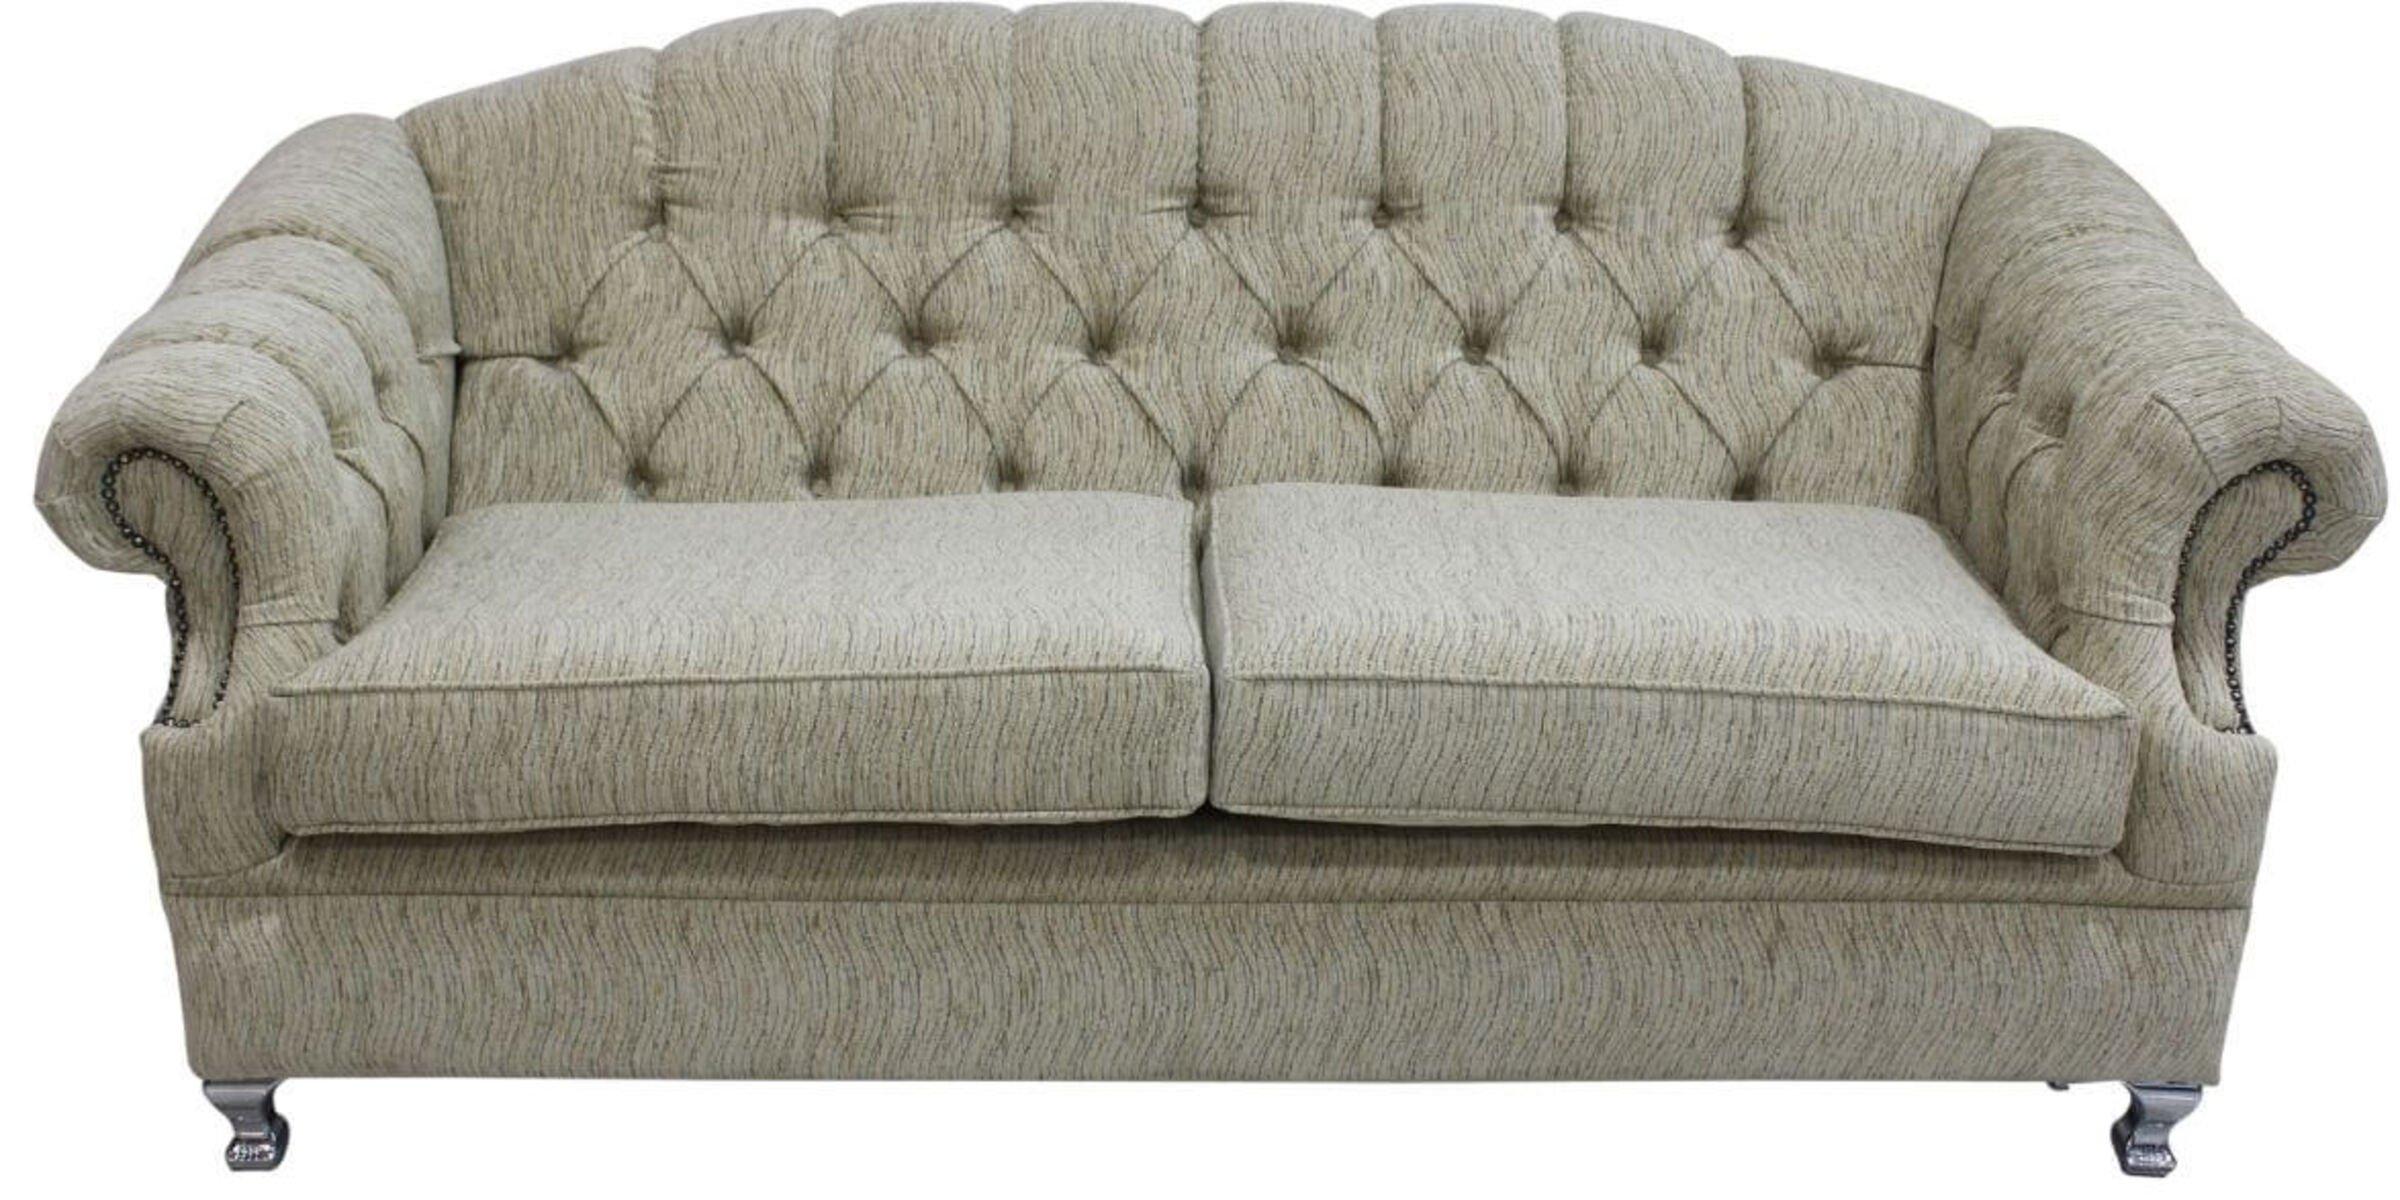 Chesterfield Merton 3 Seater Sofa Camden Ripple Honey Fabric